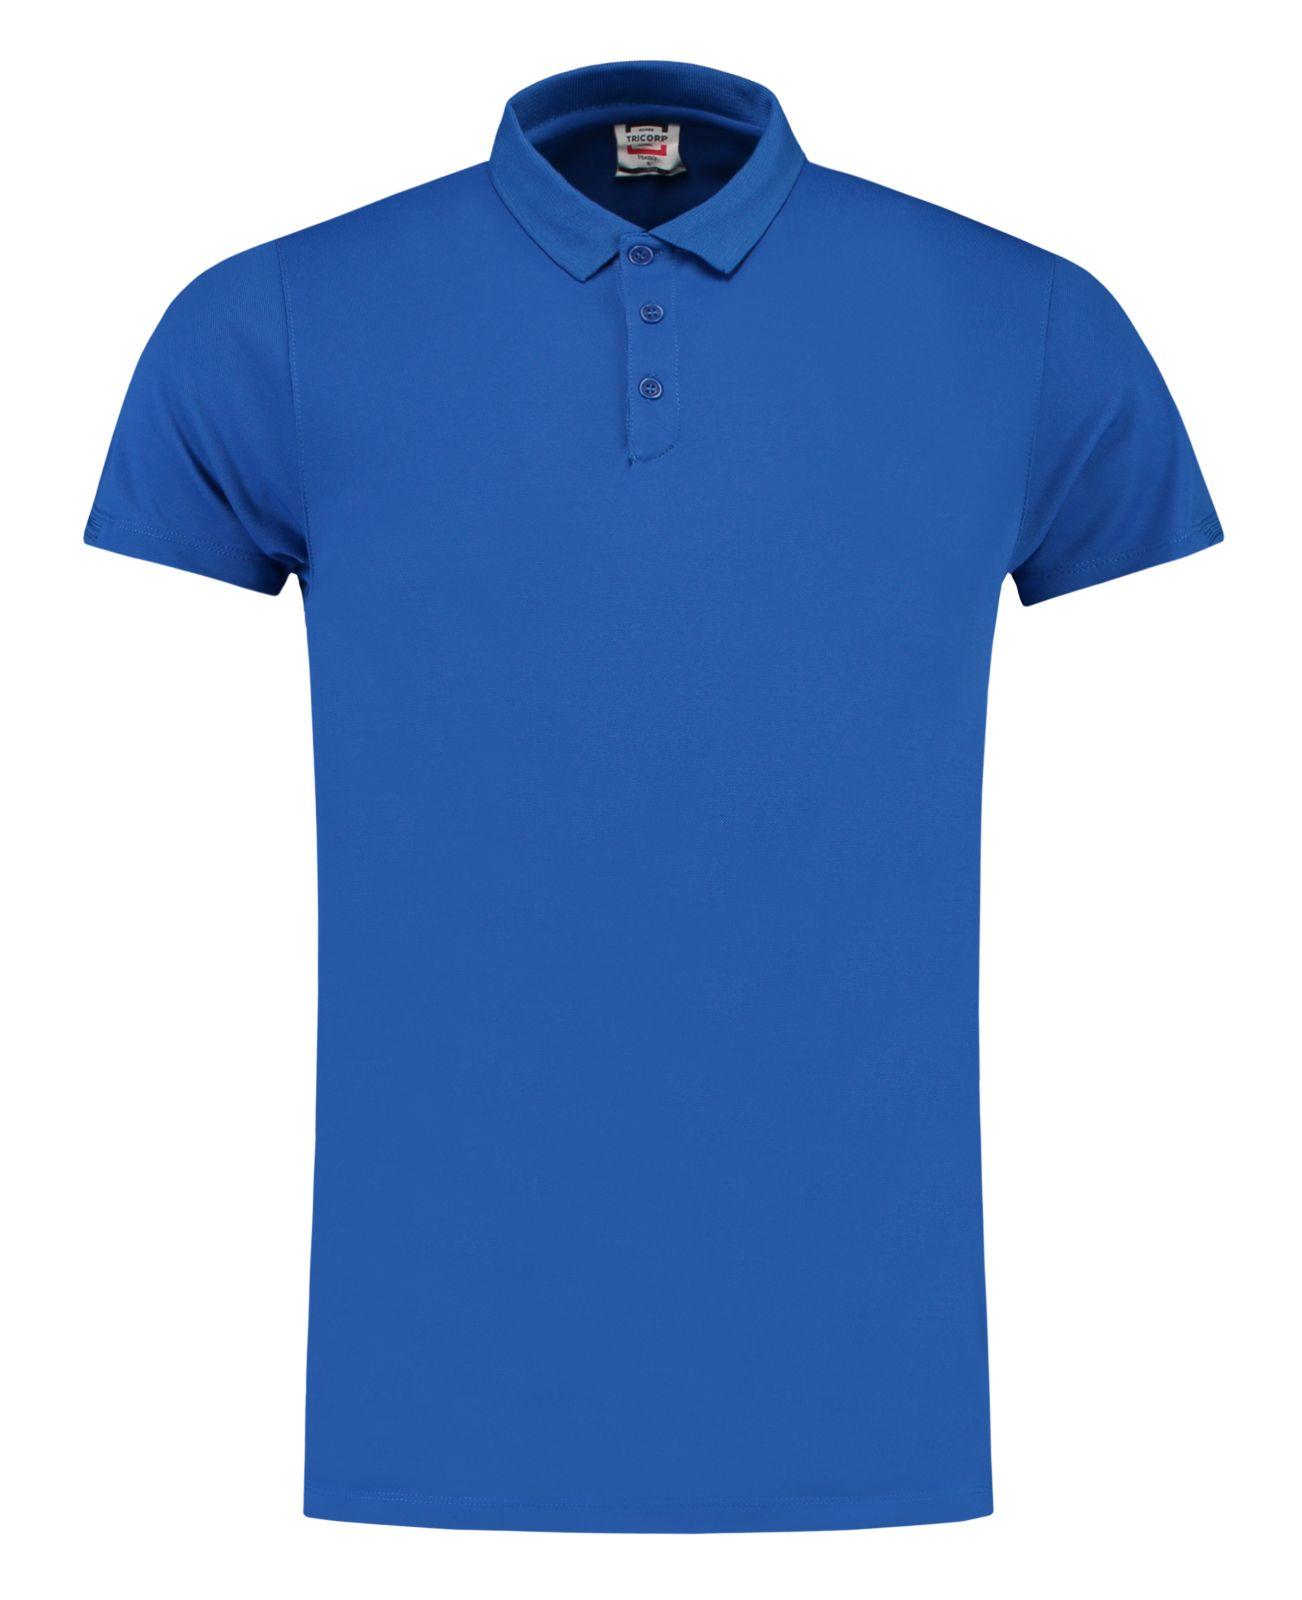 Tricorp Casual Poloshirts 201001-PBA180 koningsblauw(RoyalBlue)